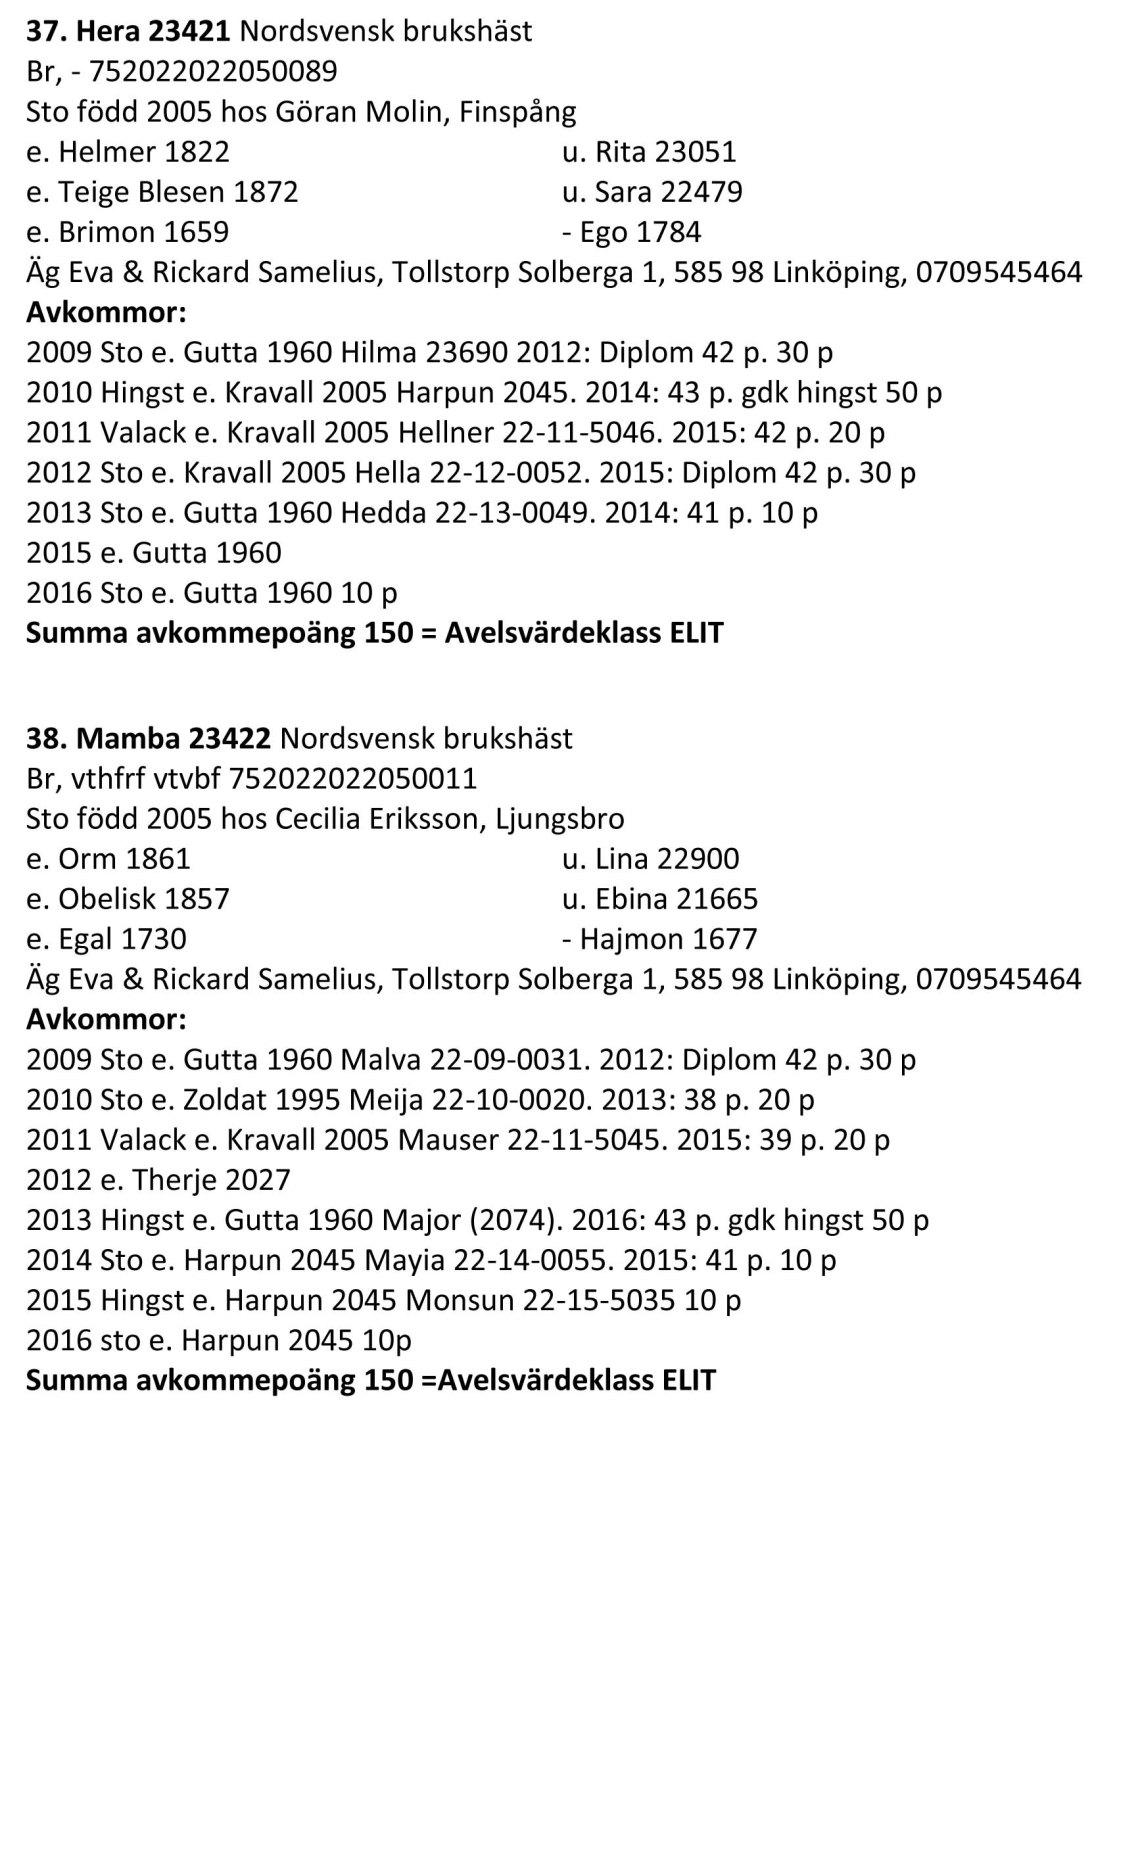 prtemierings-resultat-vreta-2016-07-09-4